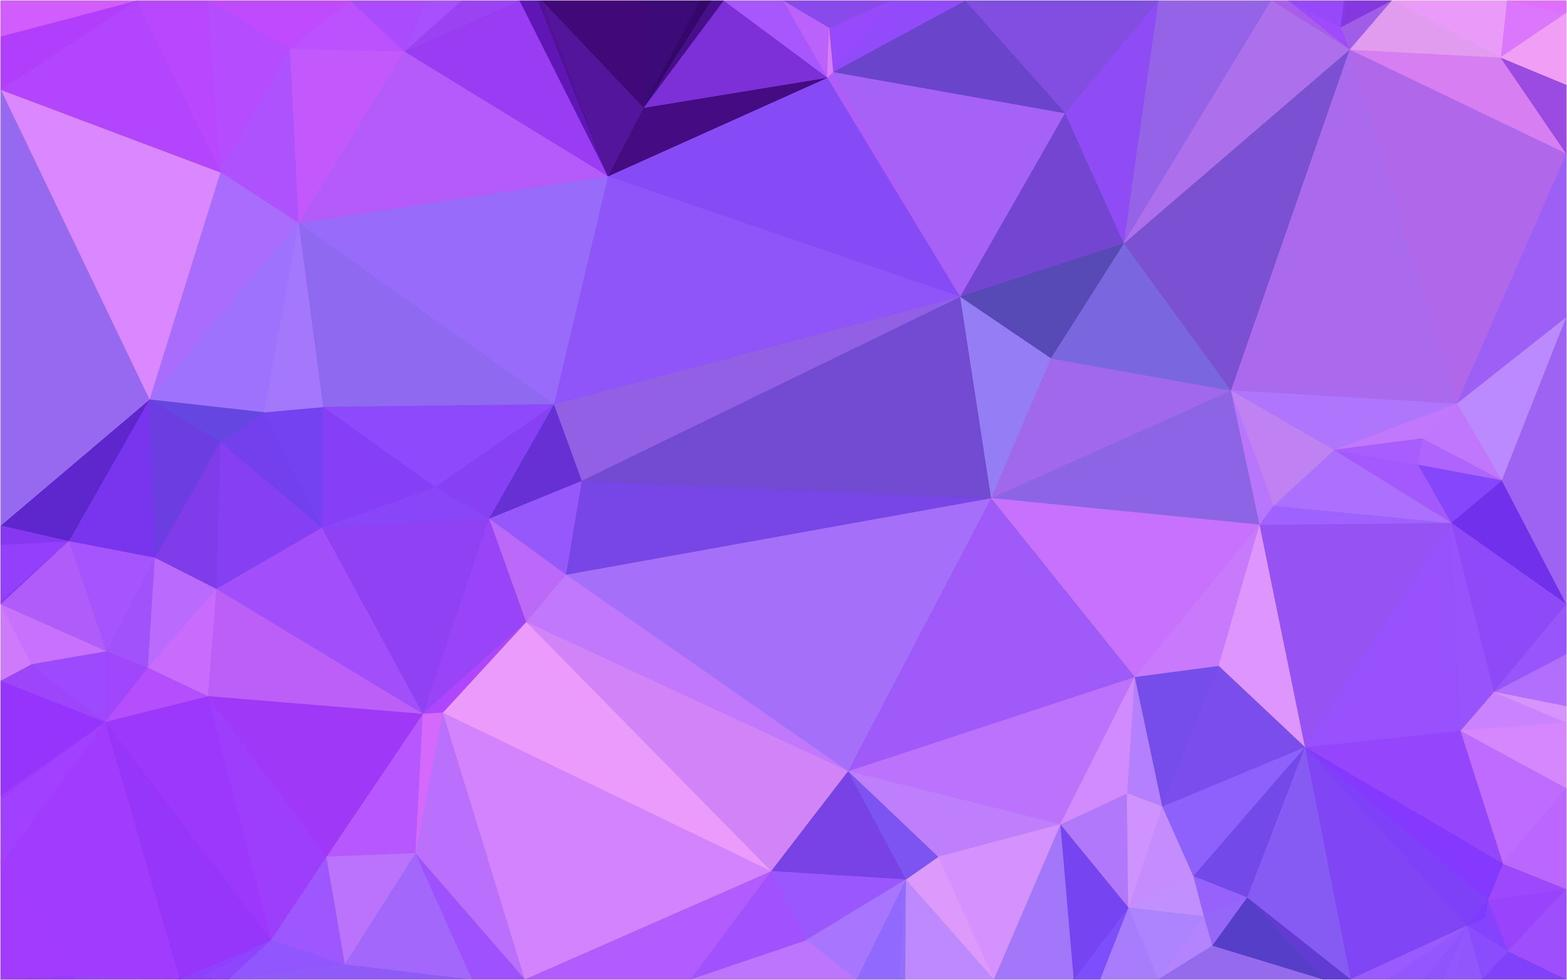 lila Poly Hintergrund vektor